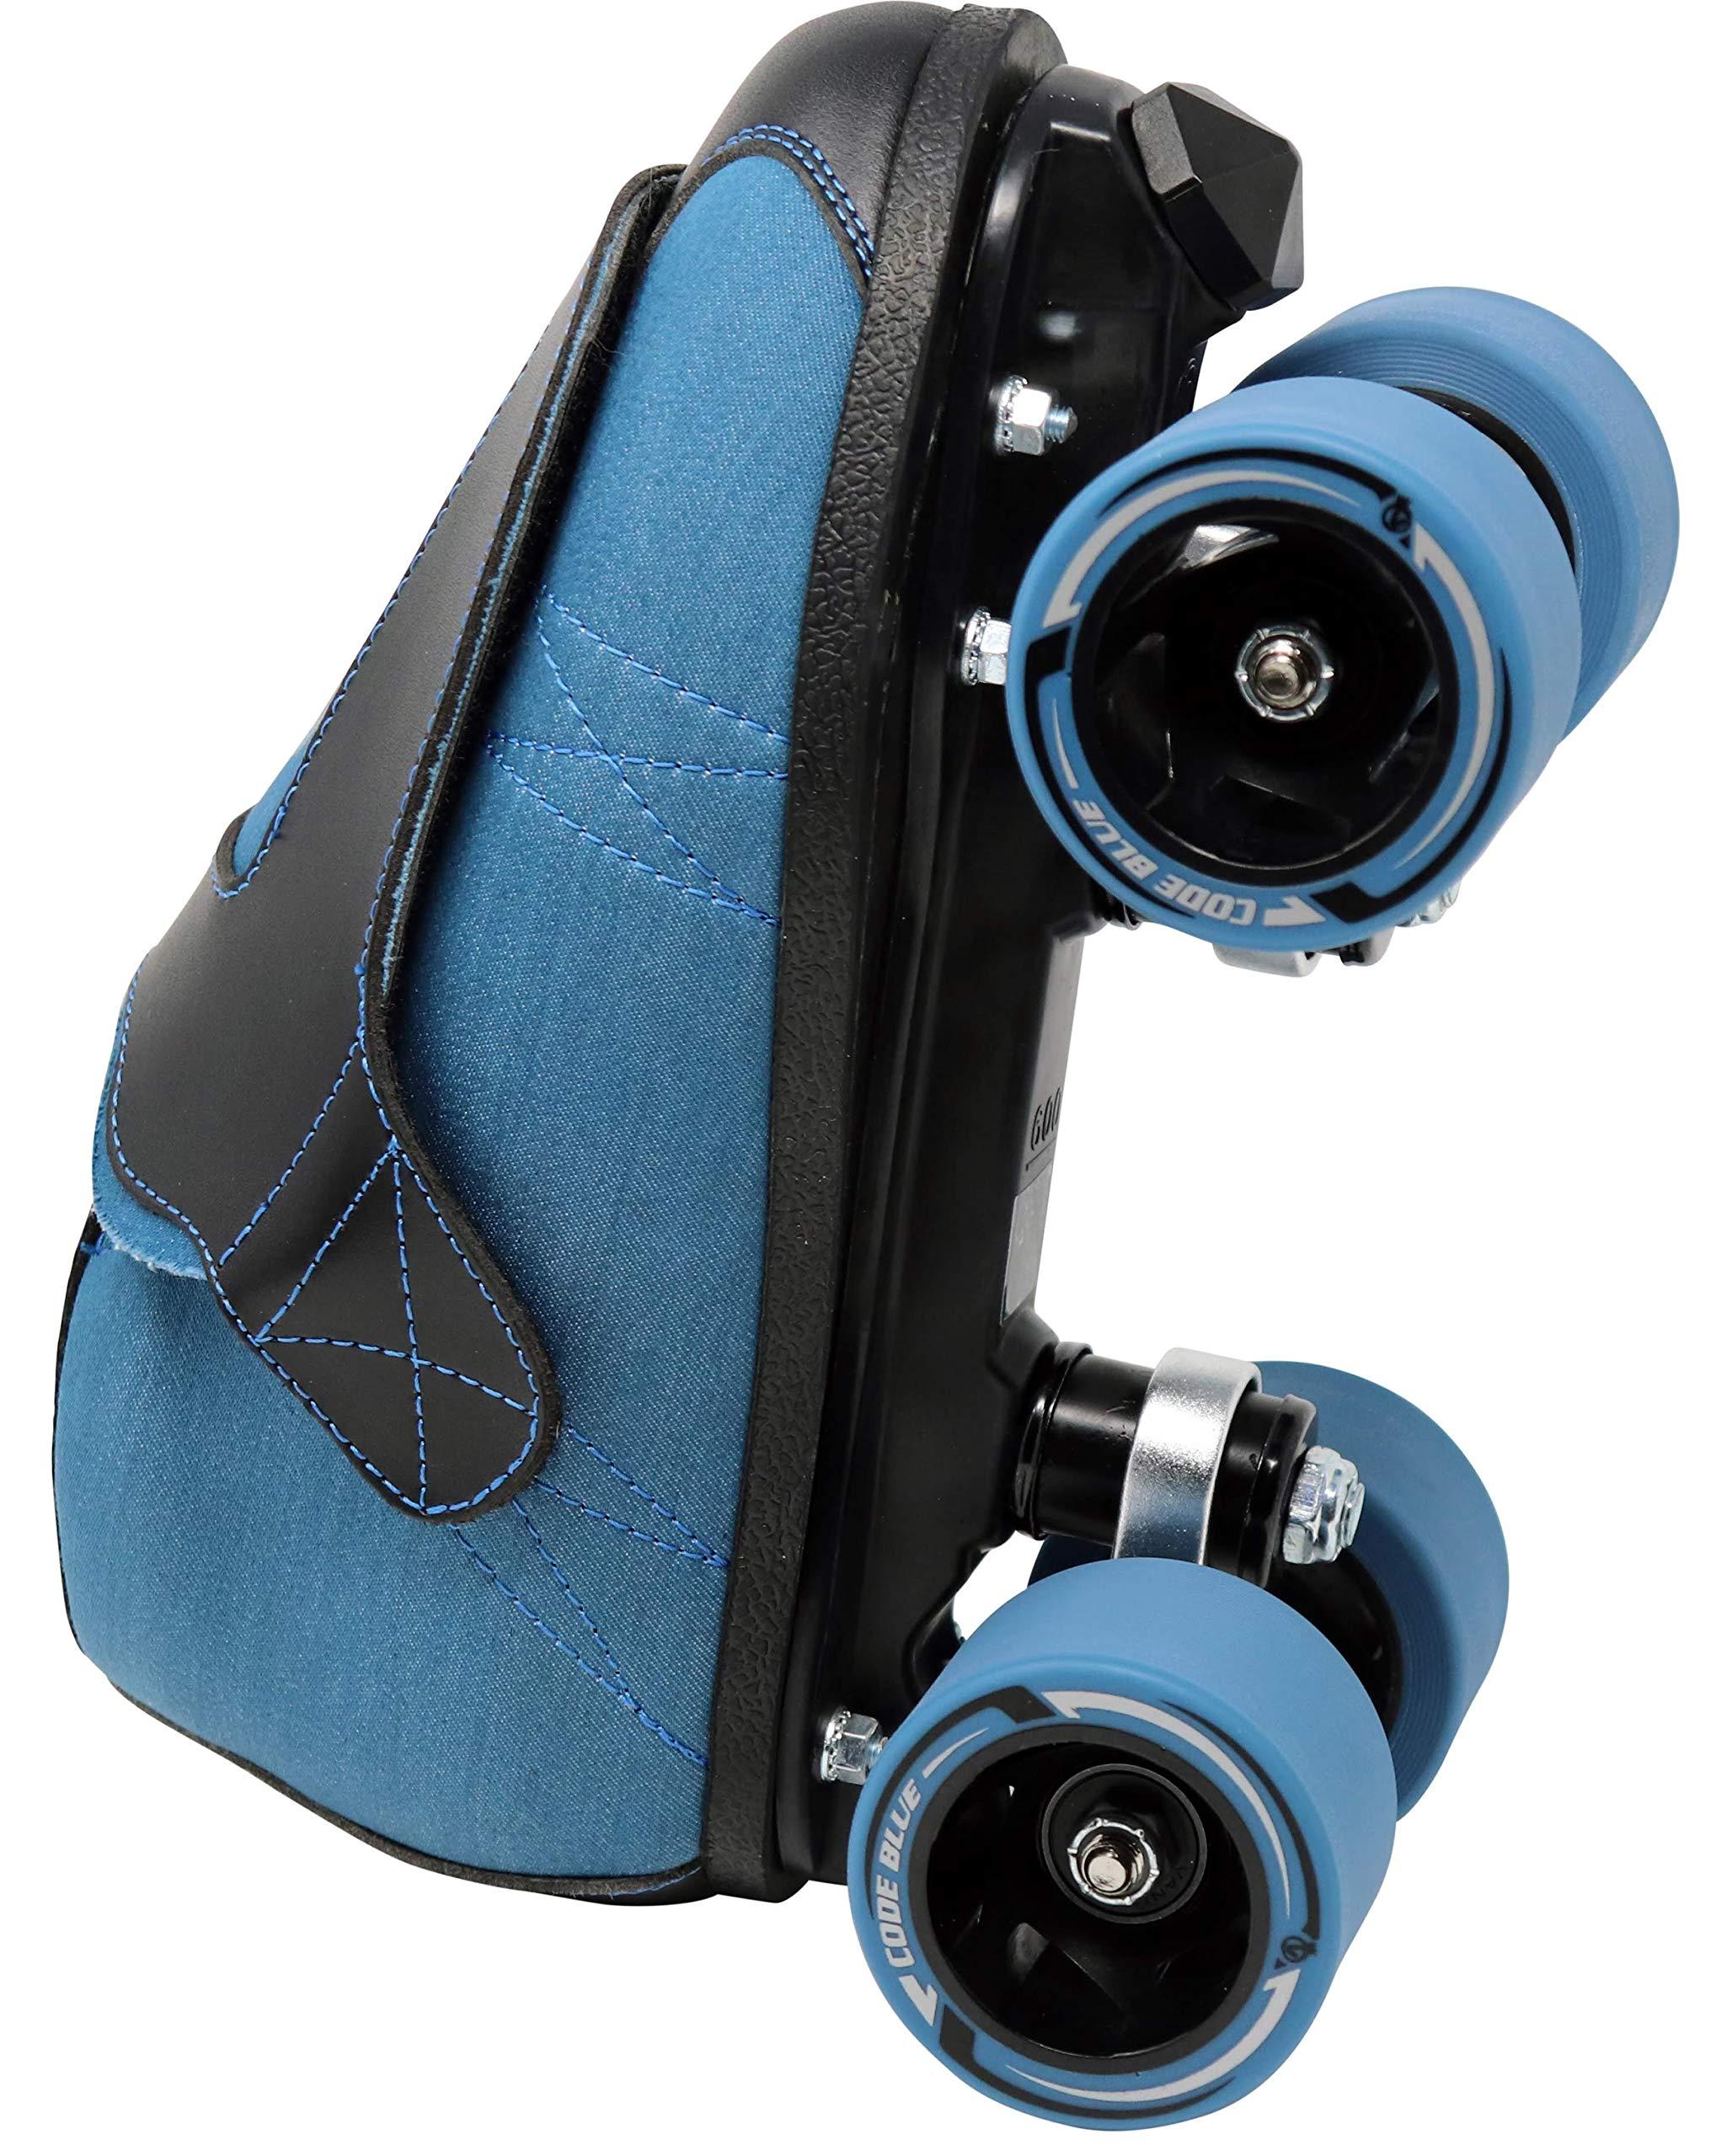 VNLA Code Blue Jam Skate - Mens & Womens Speed Skates - Quad Skates for Women & Men - Adjustable Roller Skate/Rollerskates - Outdoor & Indoor Adult Quad Skate - Kid/Kids Roller Skates (Size 4) by VNLA (Image #5)